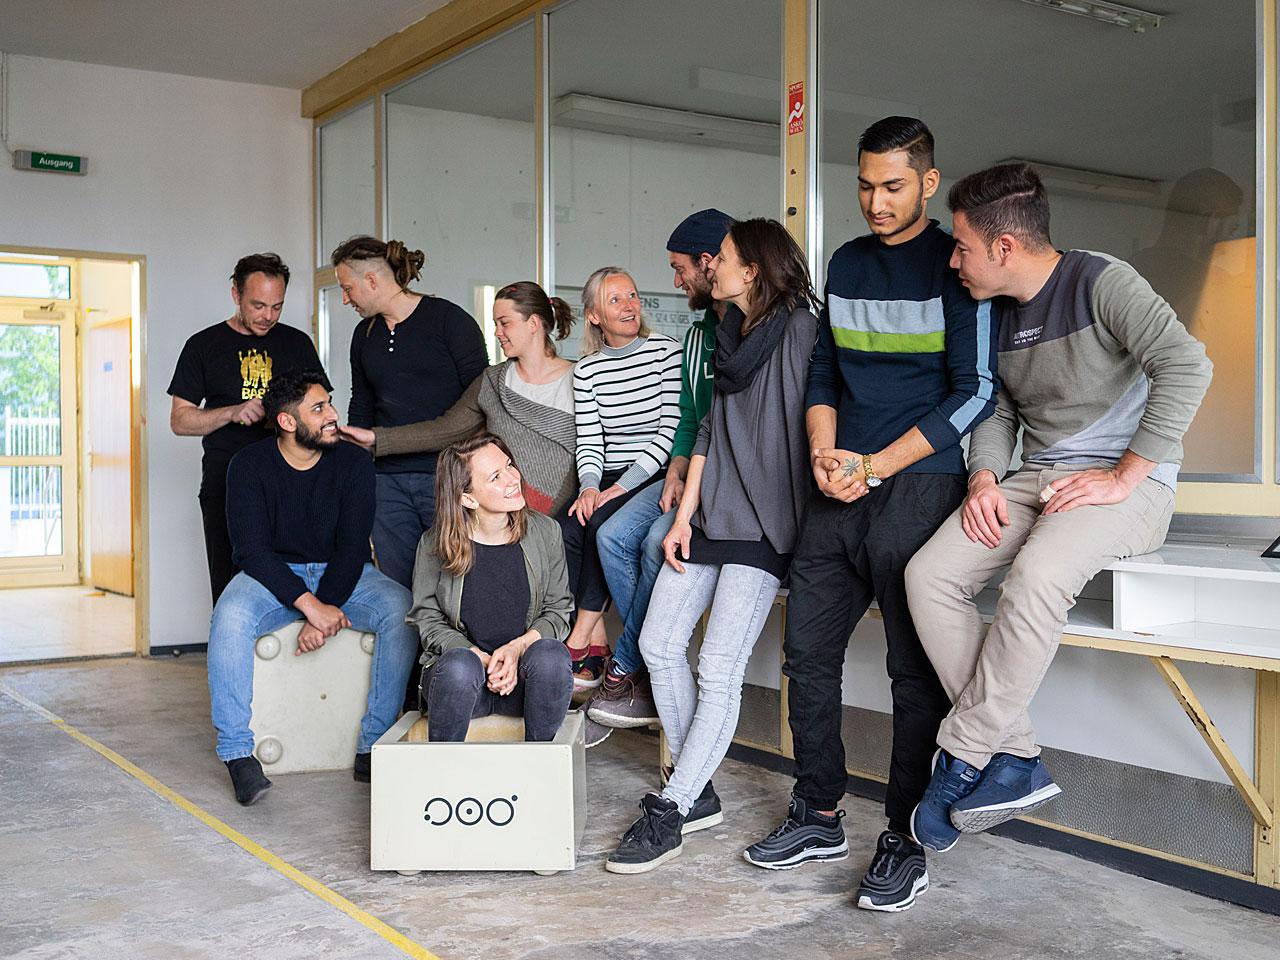 Die Materialnomaden - Fotocredit: materialnomaden, Benedikt Novak